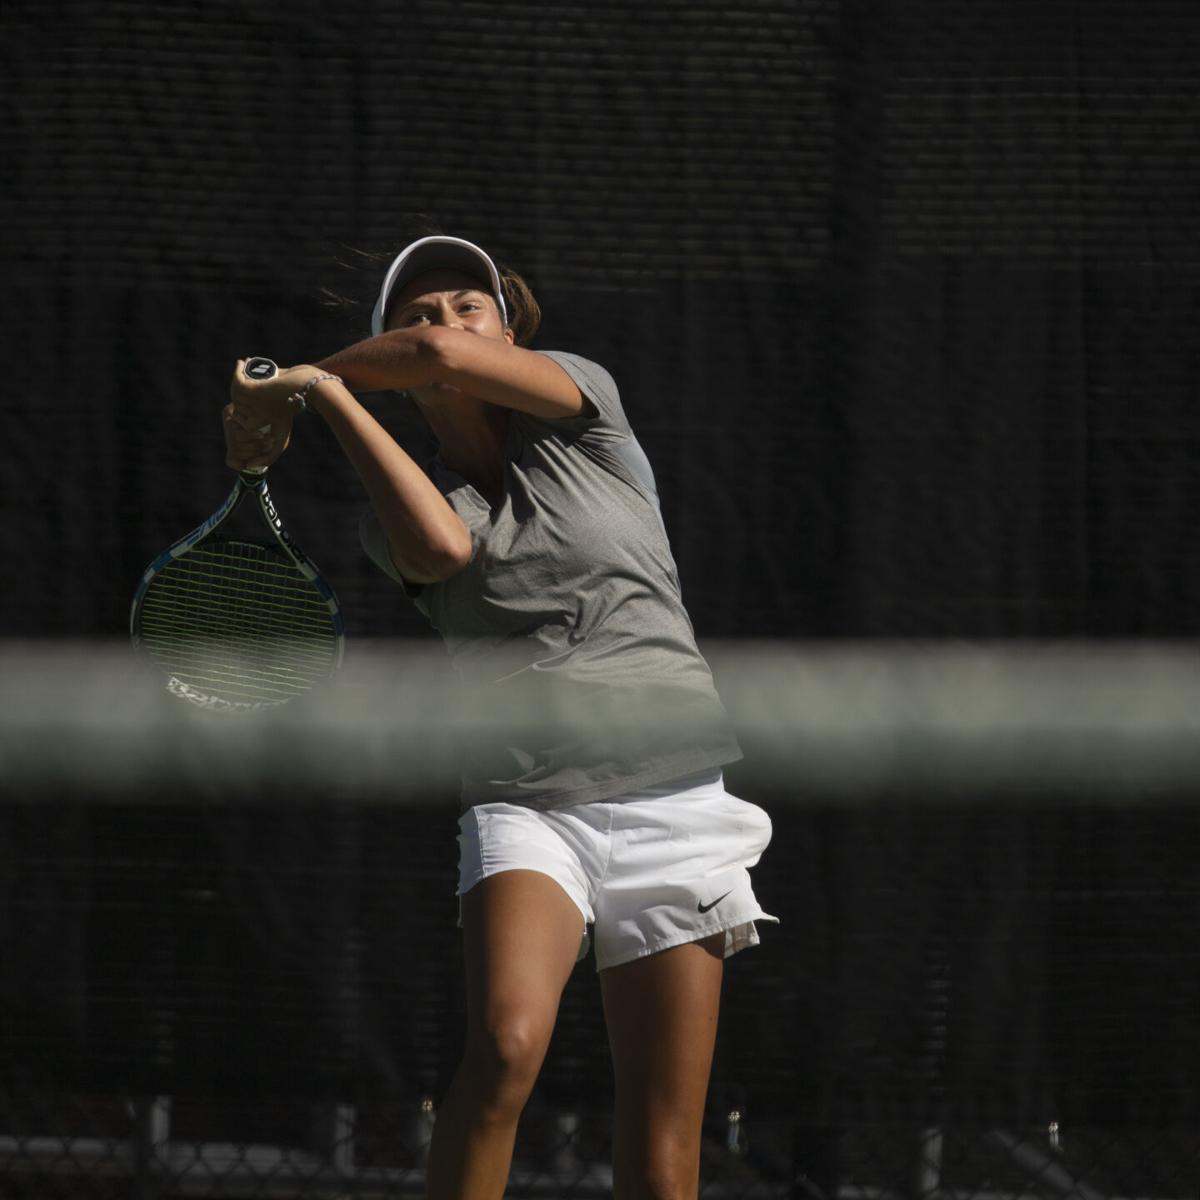 072620-sports-tennisopenwomen03-ml